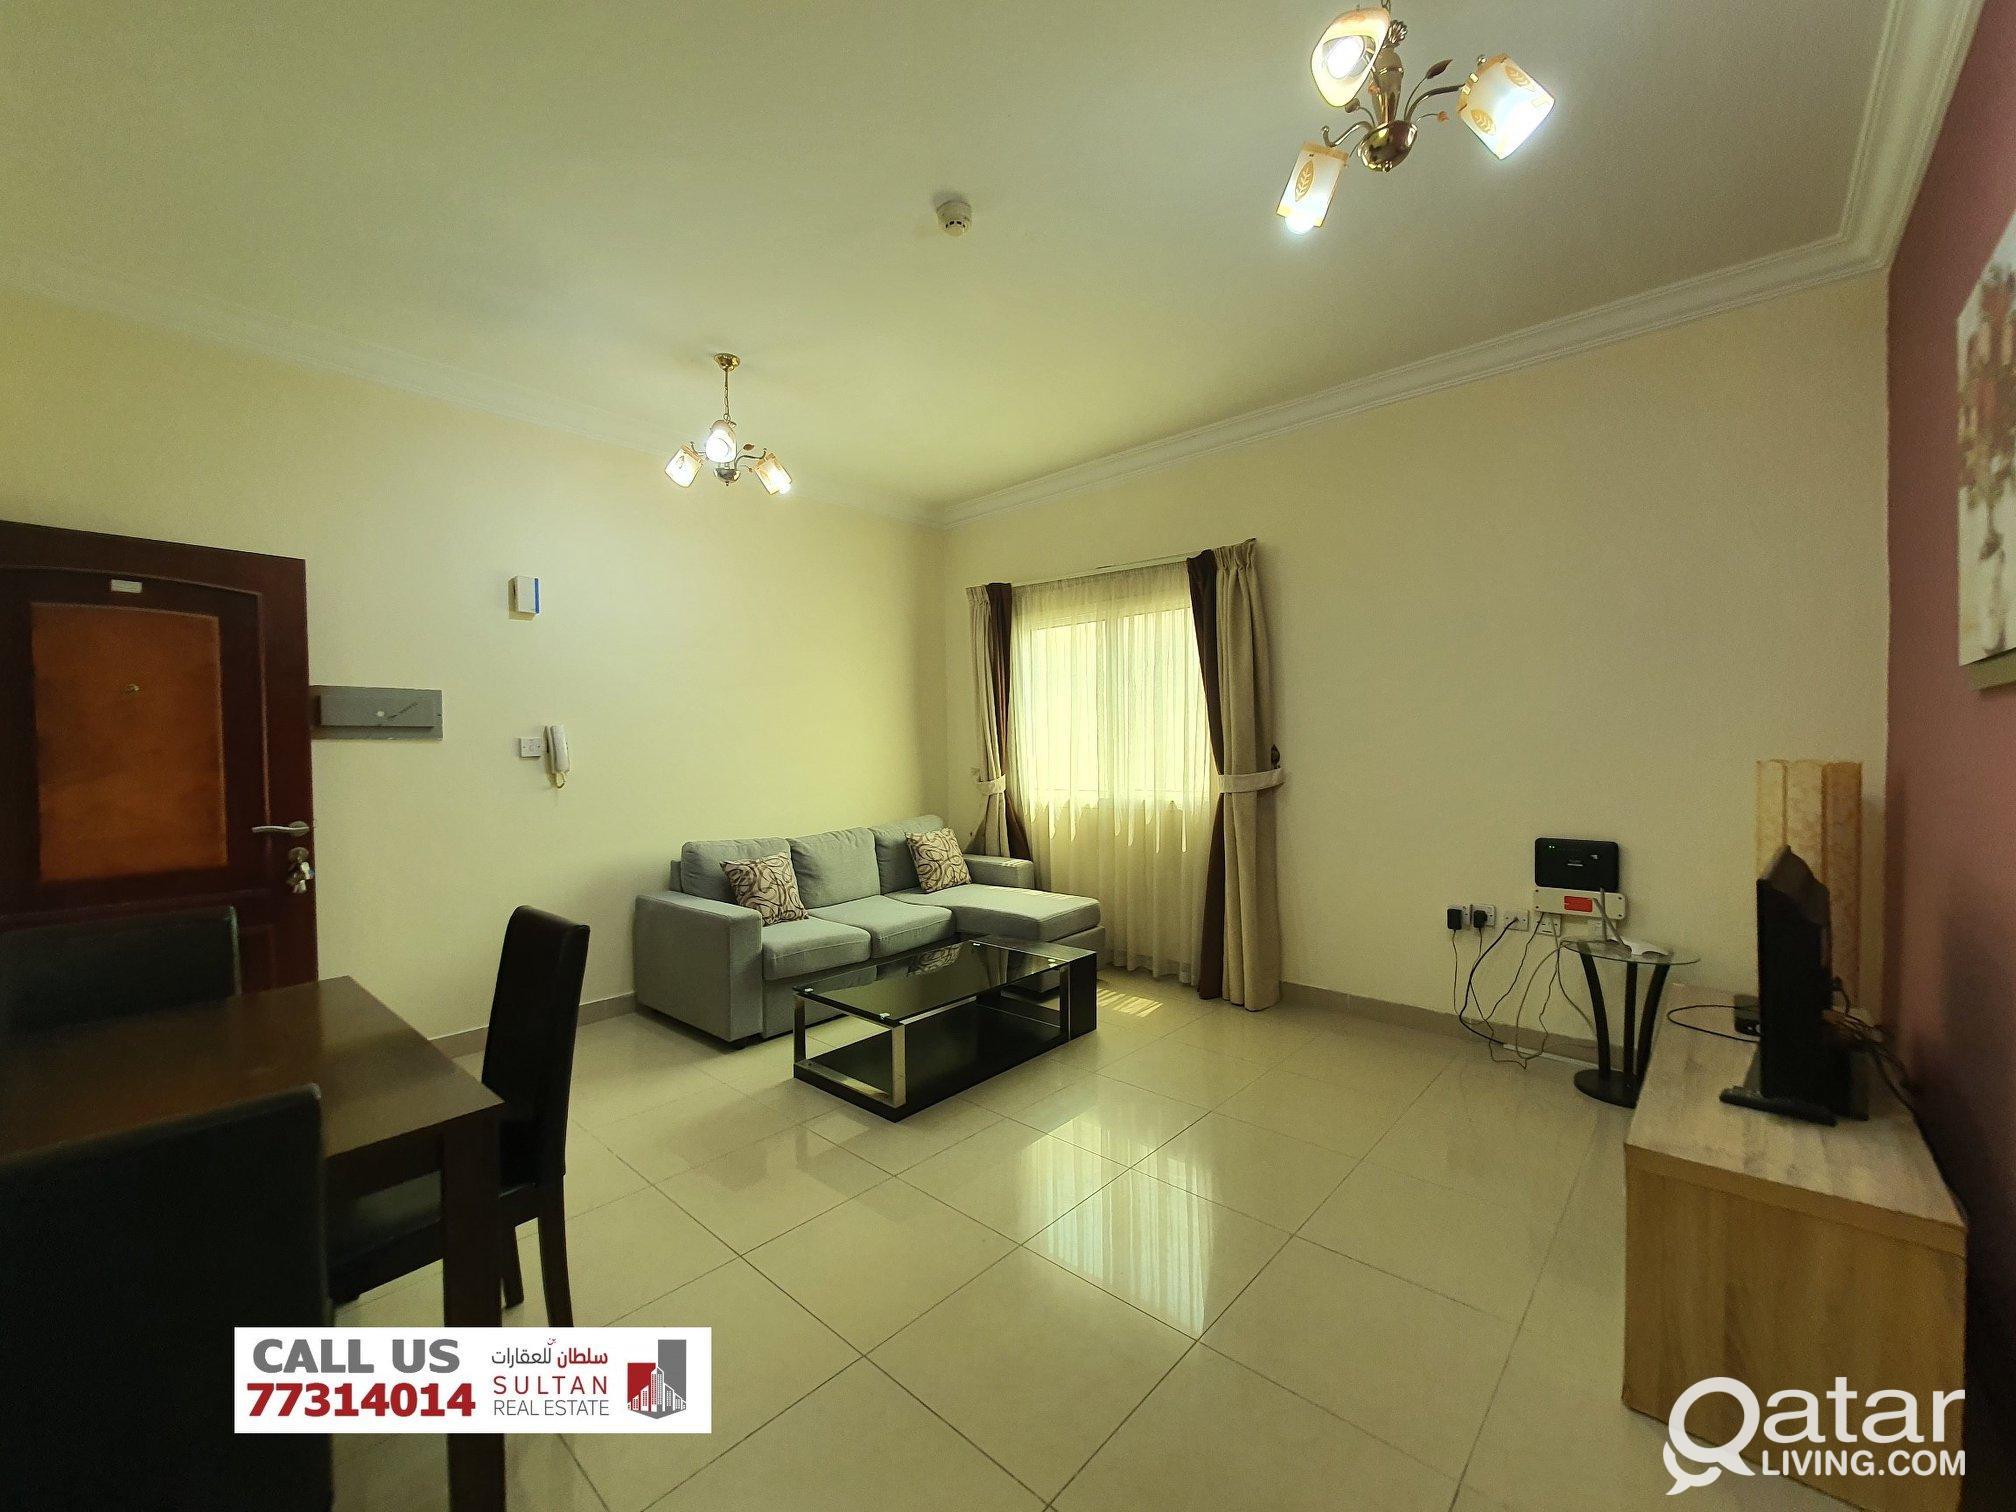 Fully furnished in Umm ghuwailina